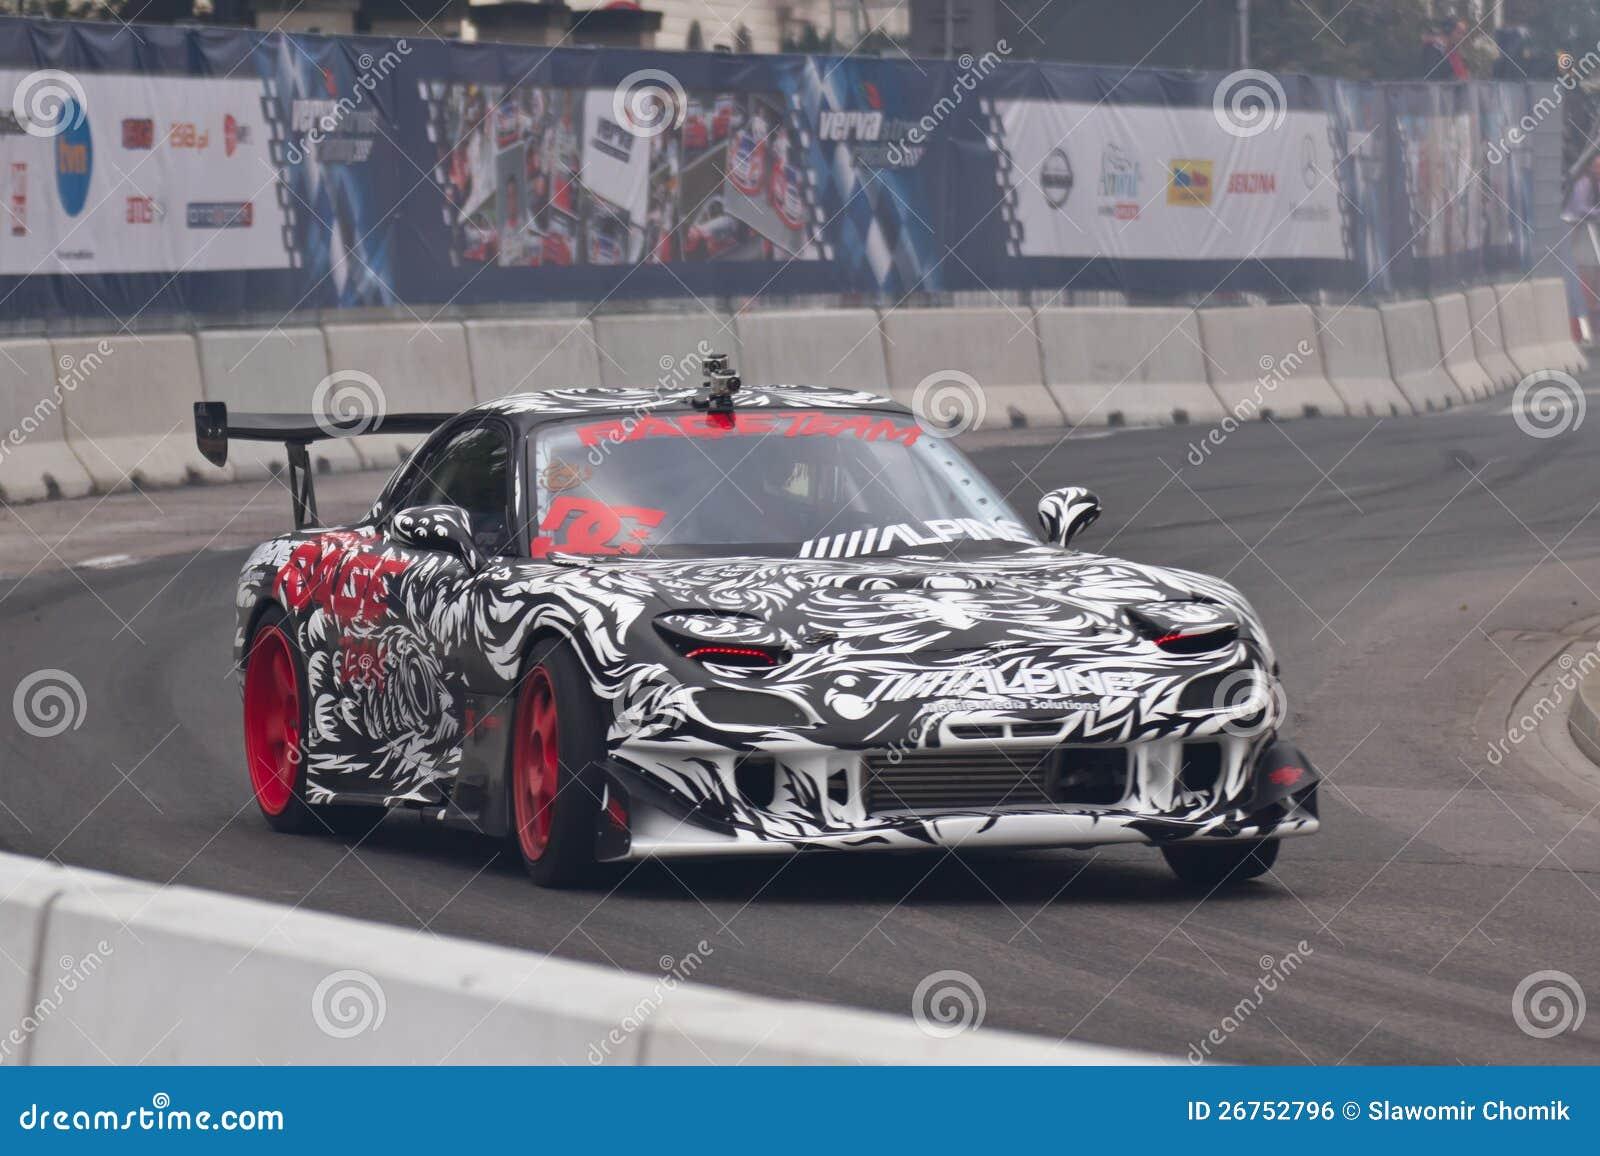 Verva Street Racing 2012 - Racing Car Editorial Photo - Image of ...